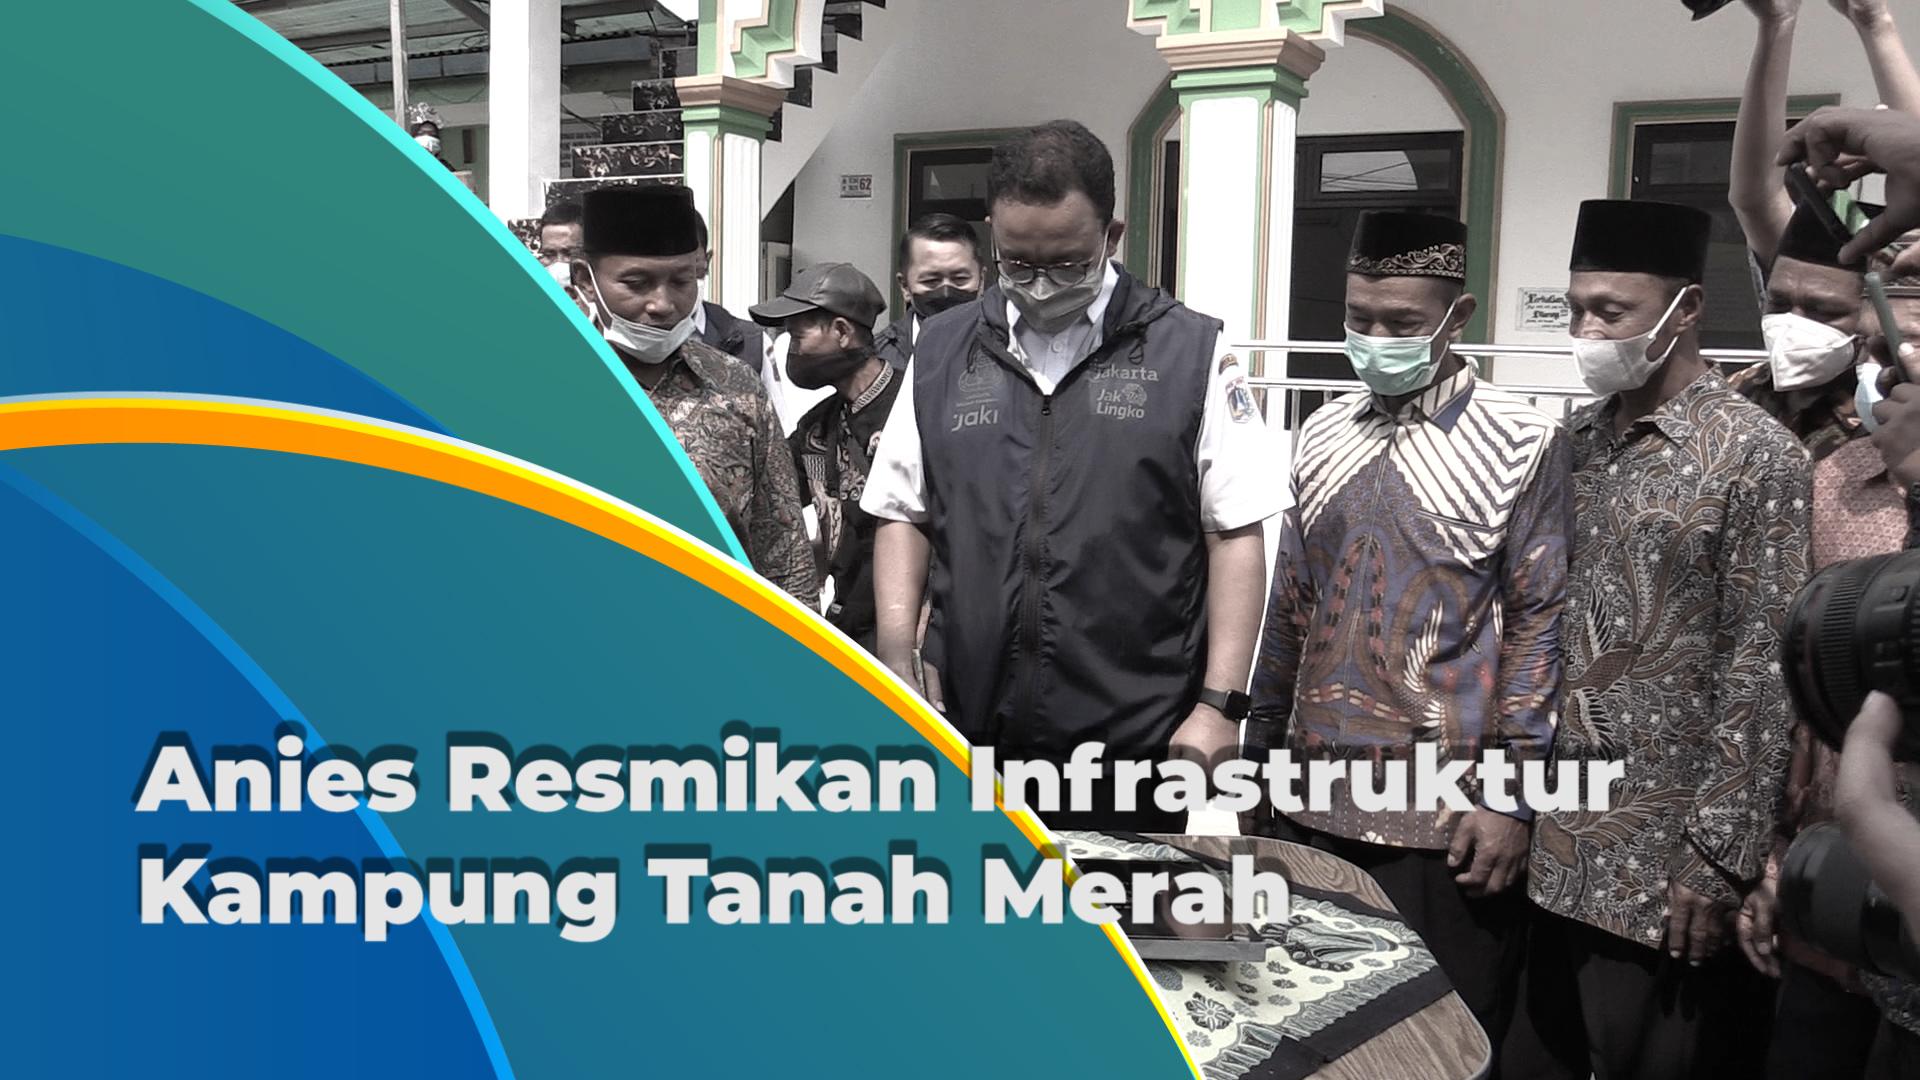 Infrastruktur Kampung Tanah Merah Diresmikan